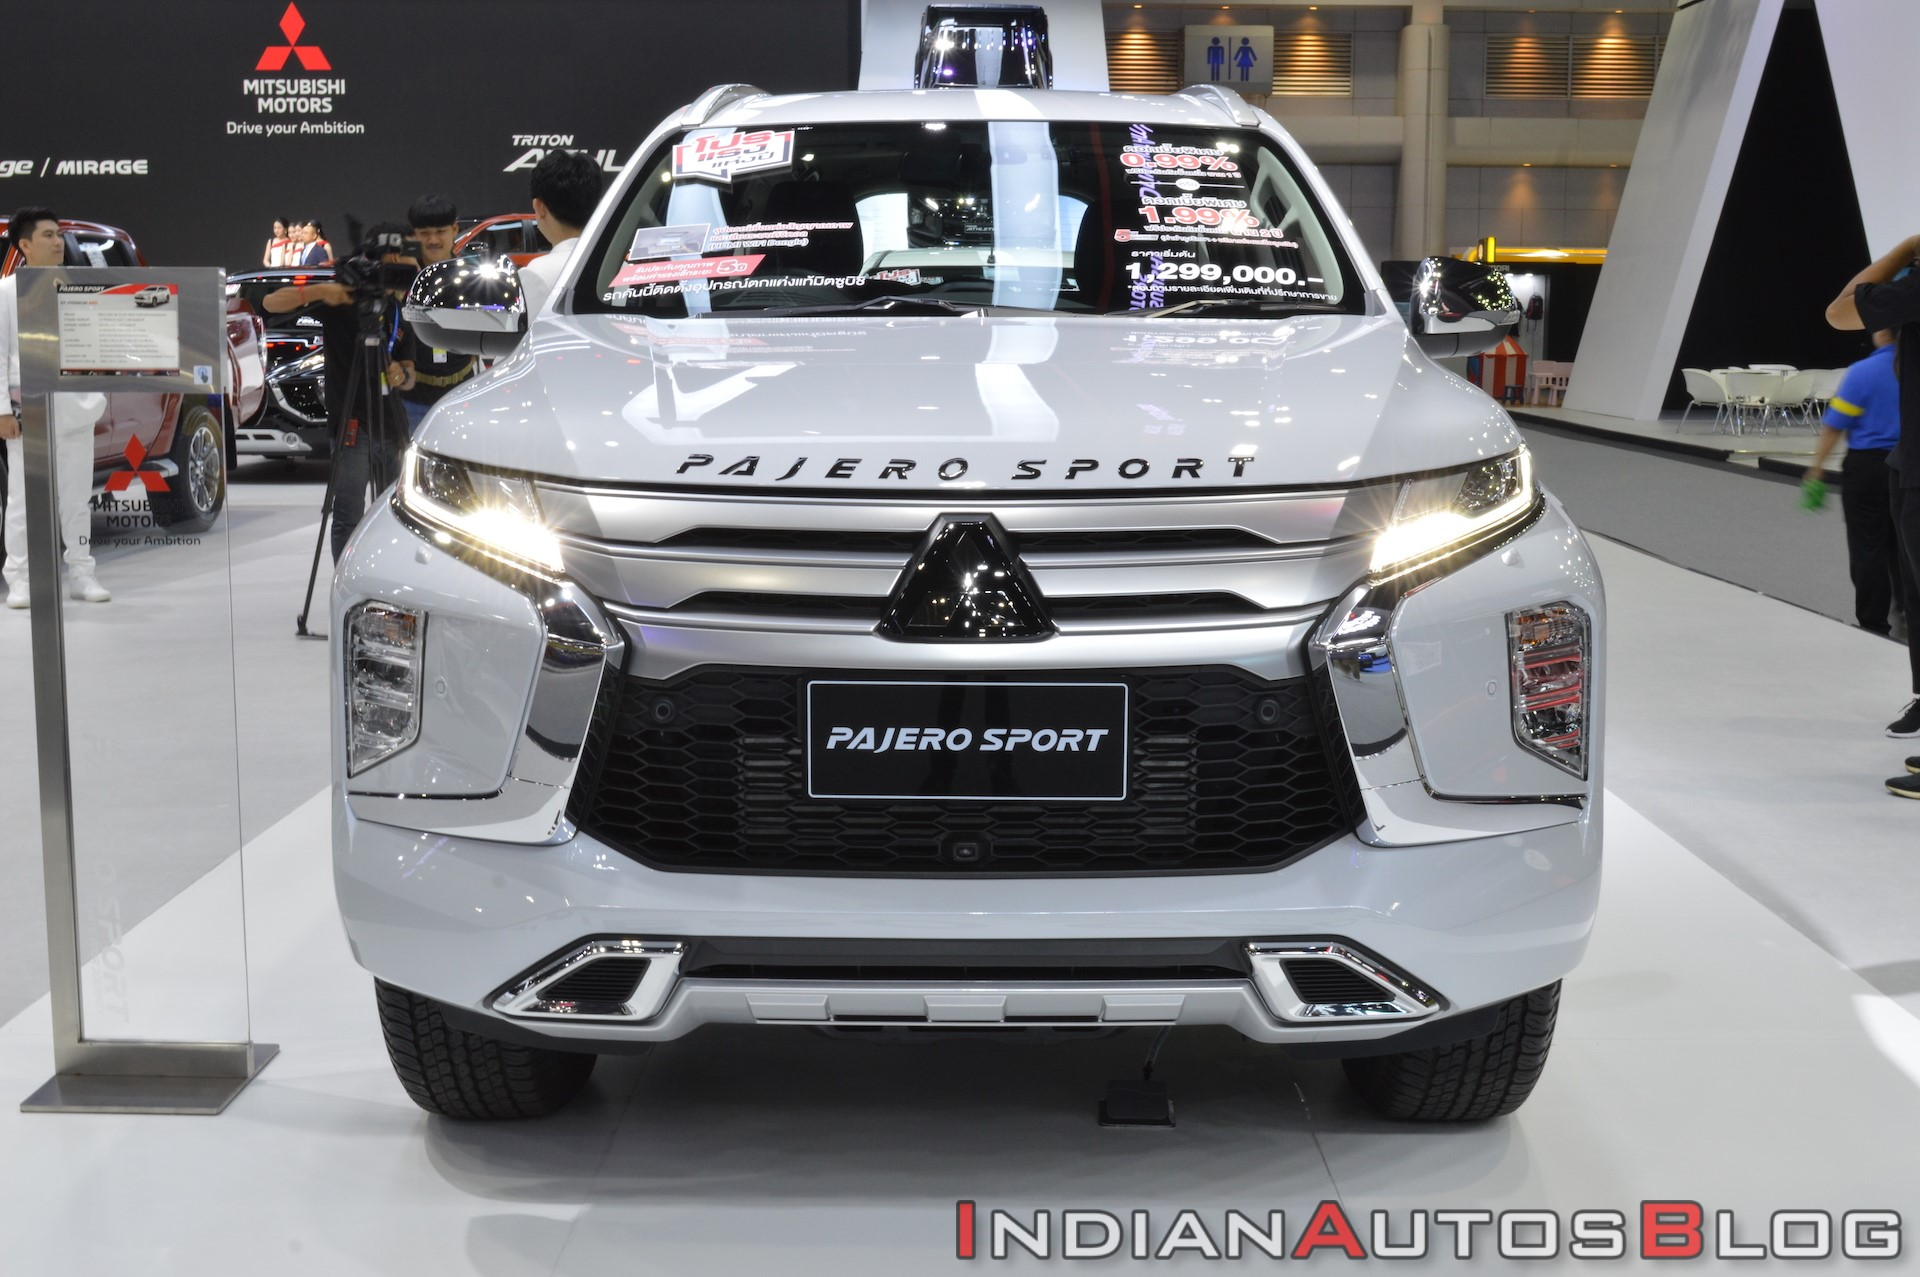 All New Mitsubishi Pajero Sport Displayed at 2019 Thai Motor Expo 4